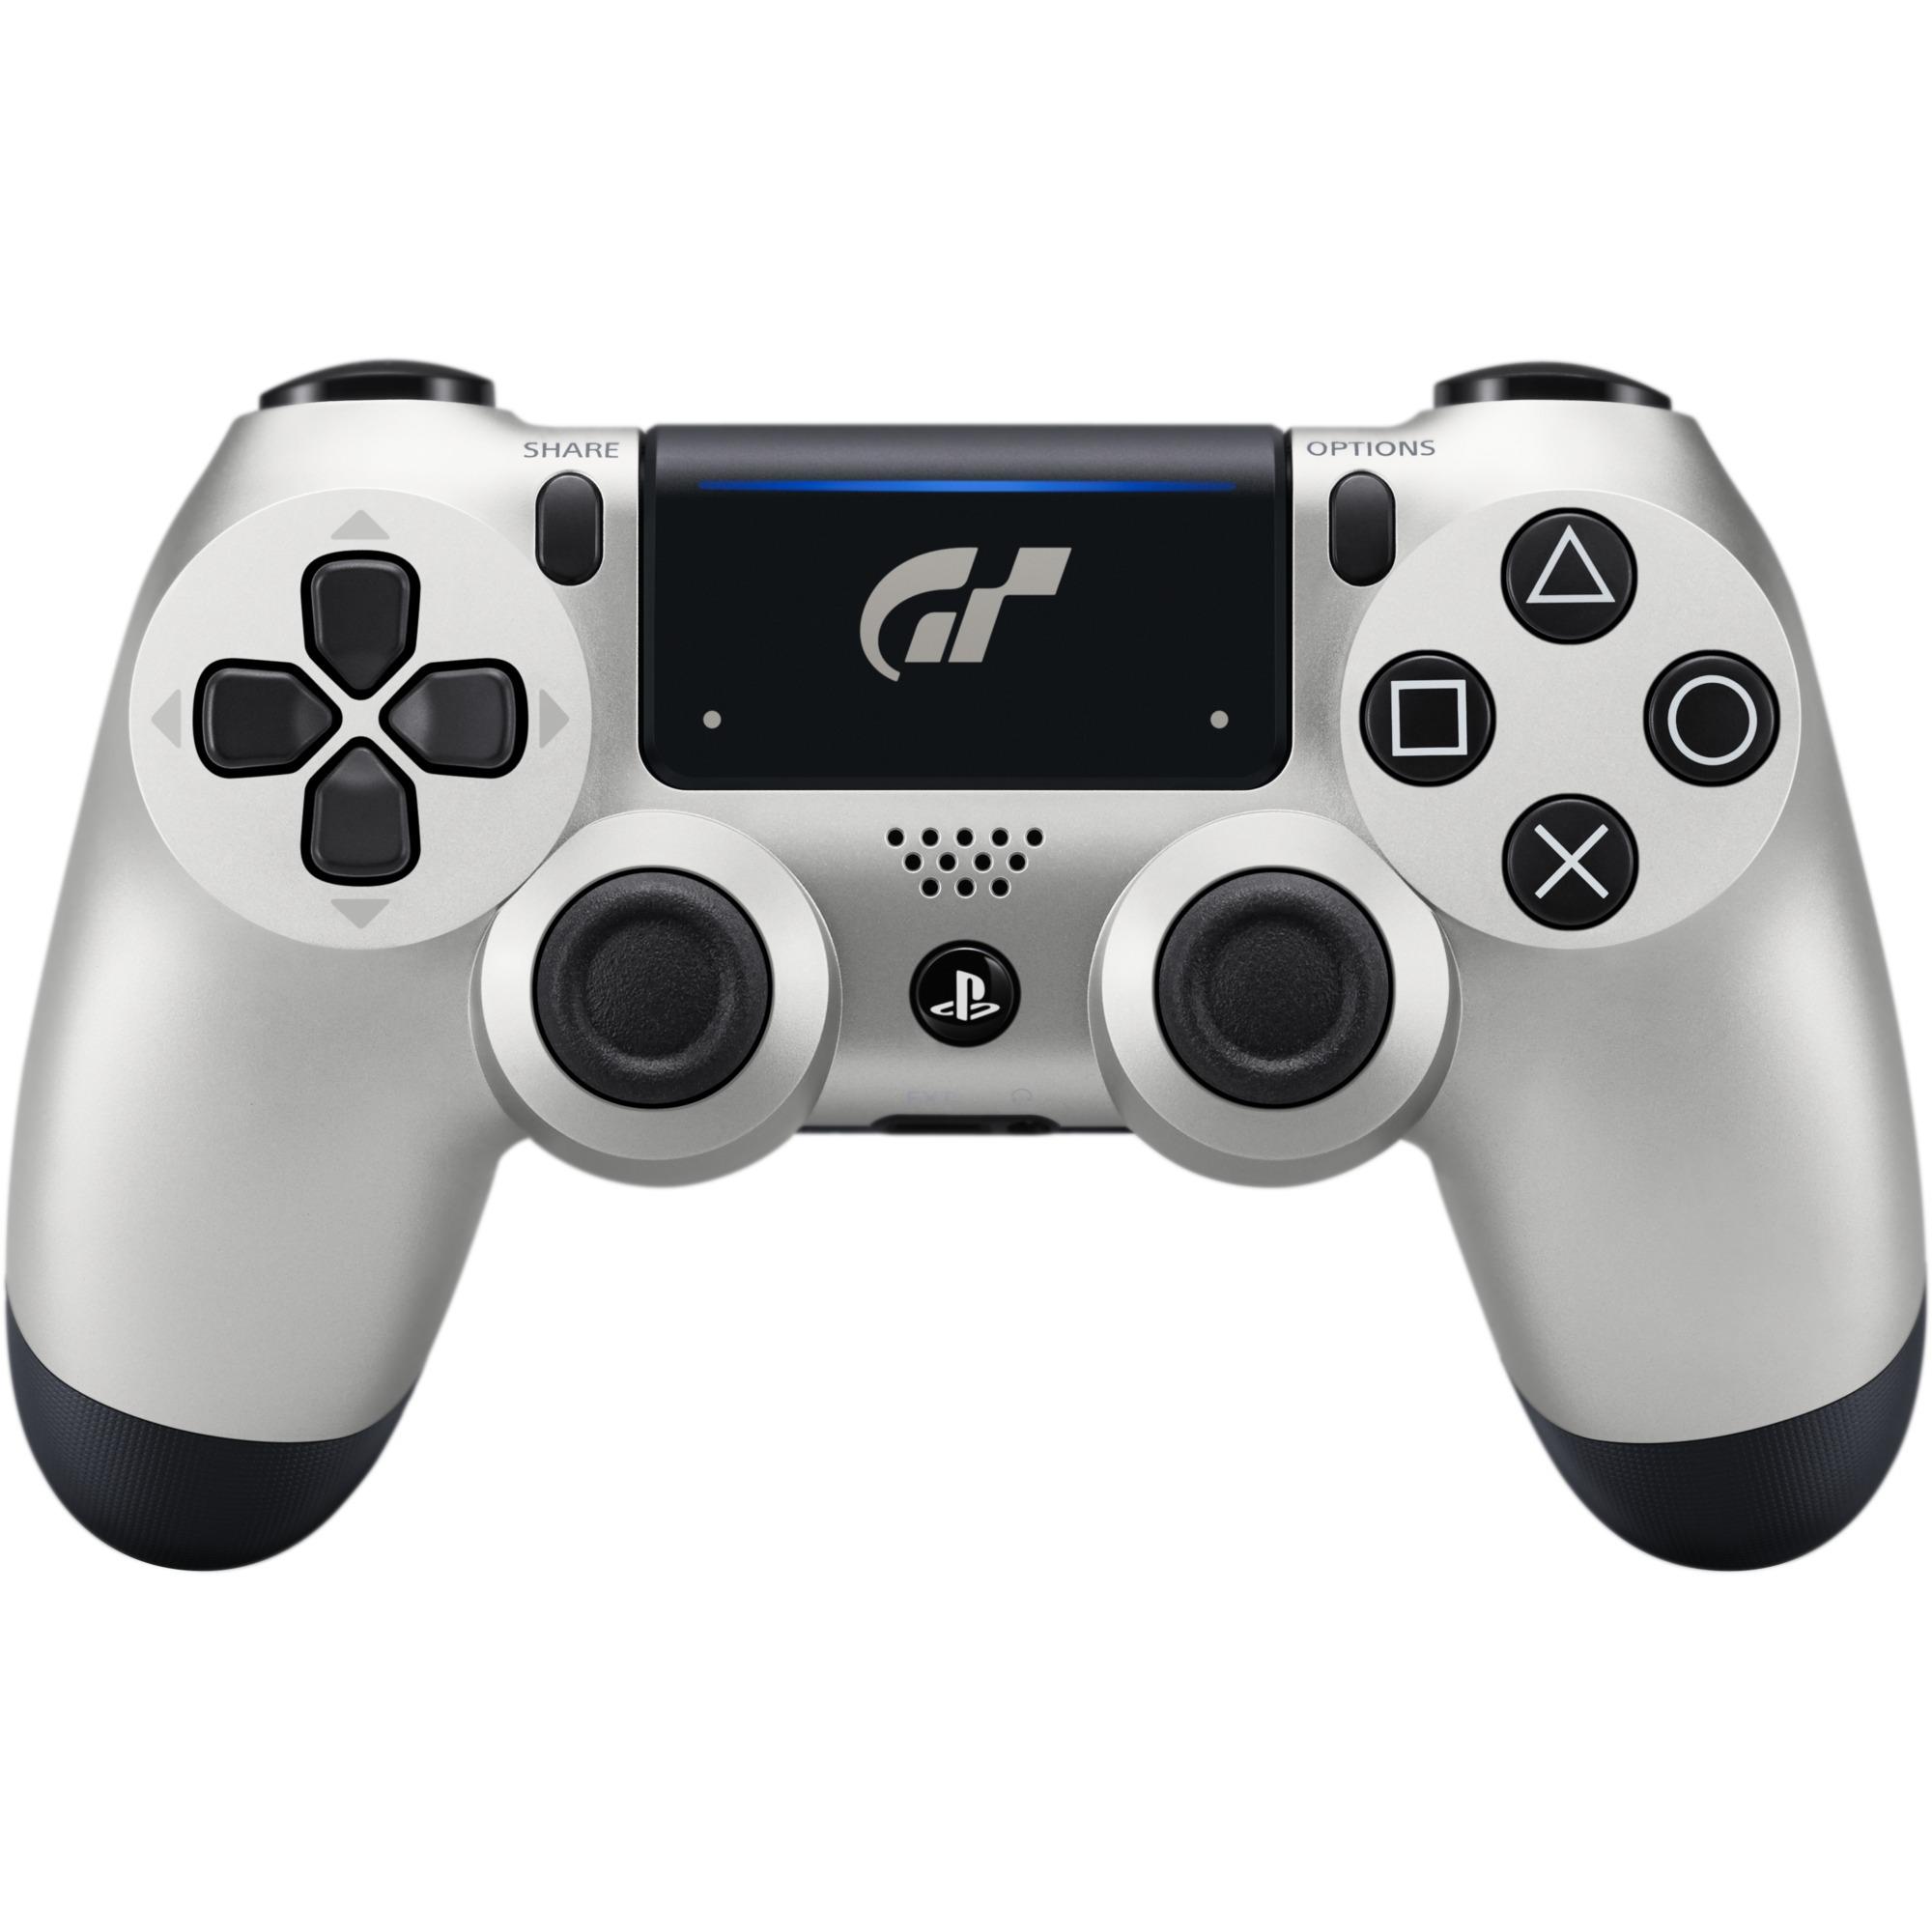 DUALSHOCK 4 Limited Edition GT Sport Manette de jeu PlayStation 4 Noir, Argent